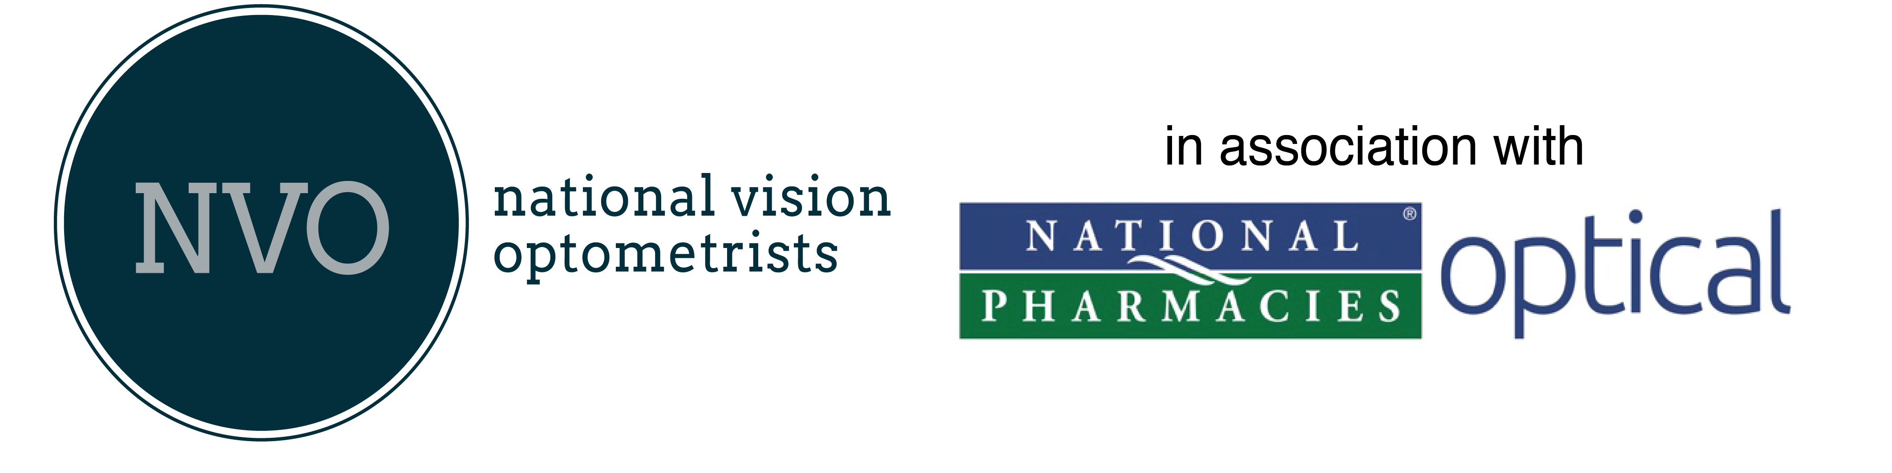 National Vision Optometrists - Marion